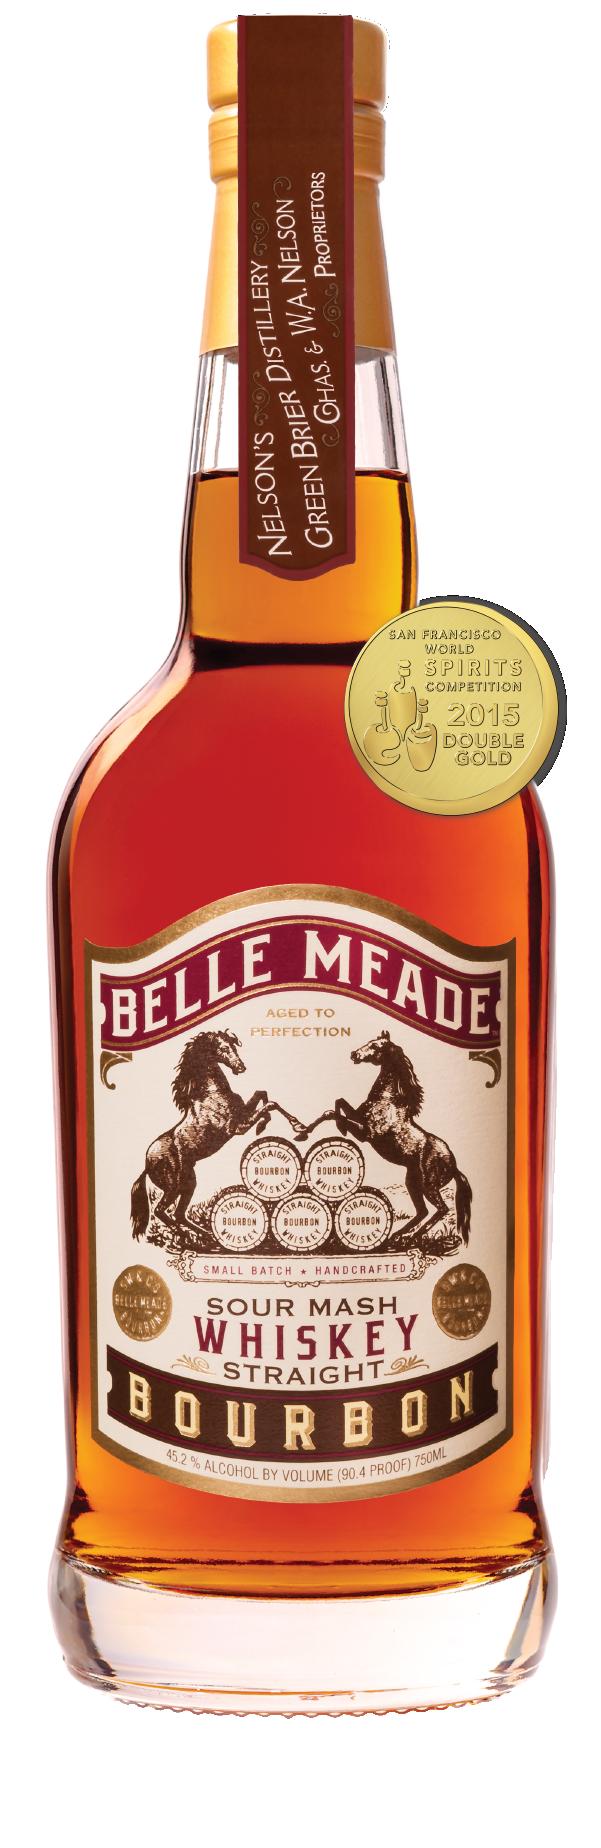 Belle Meade Bourbon_Classic